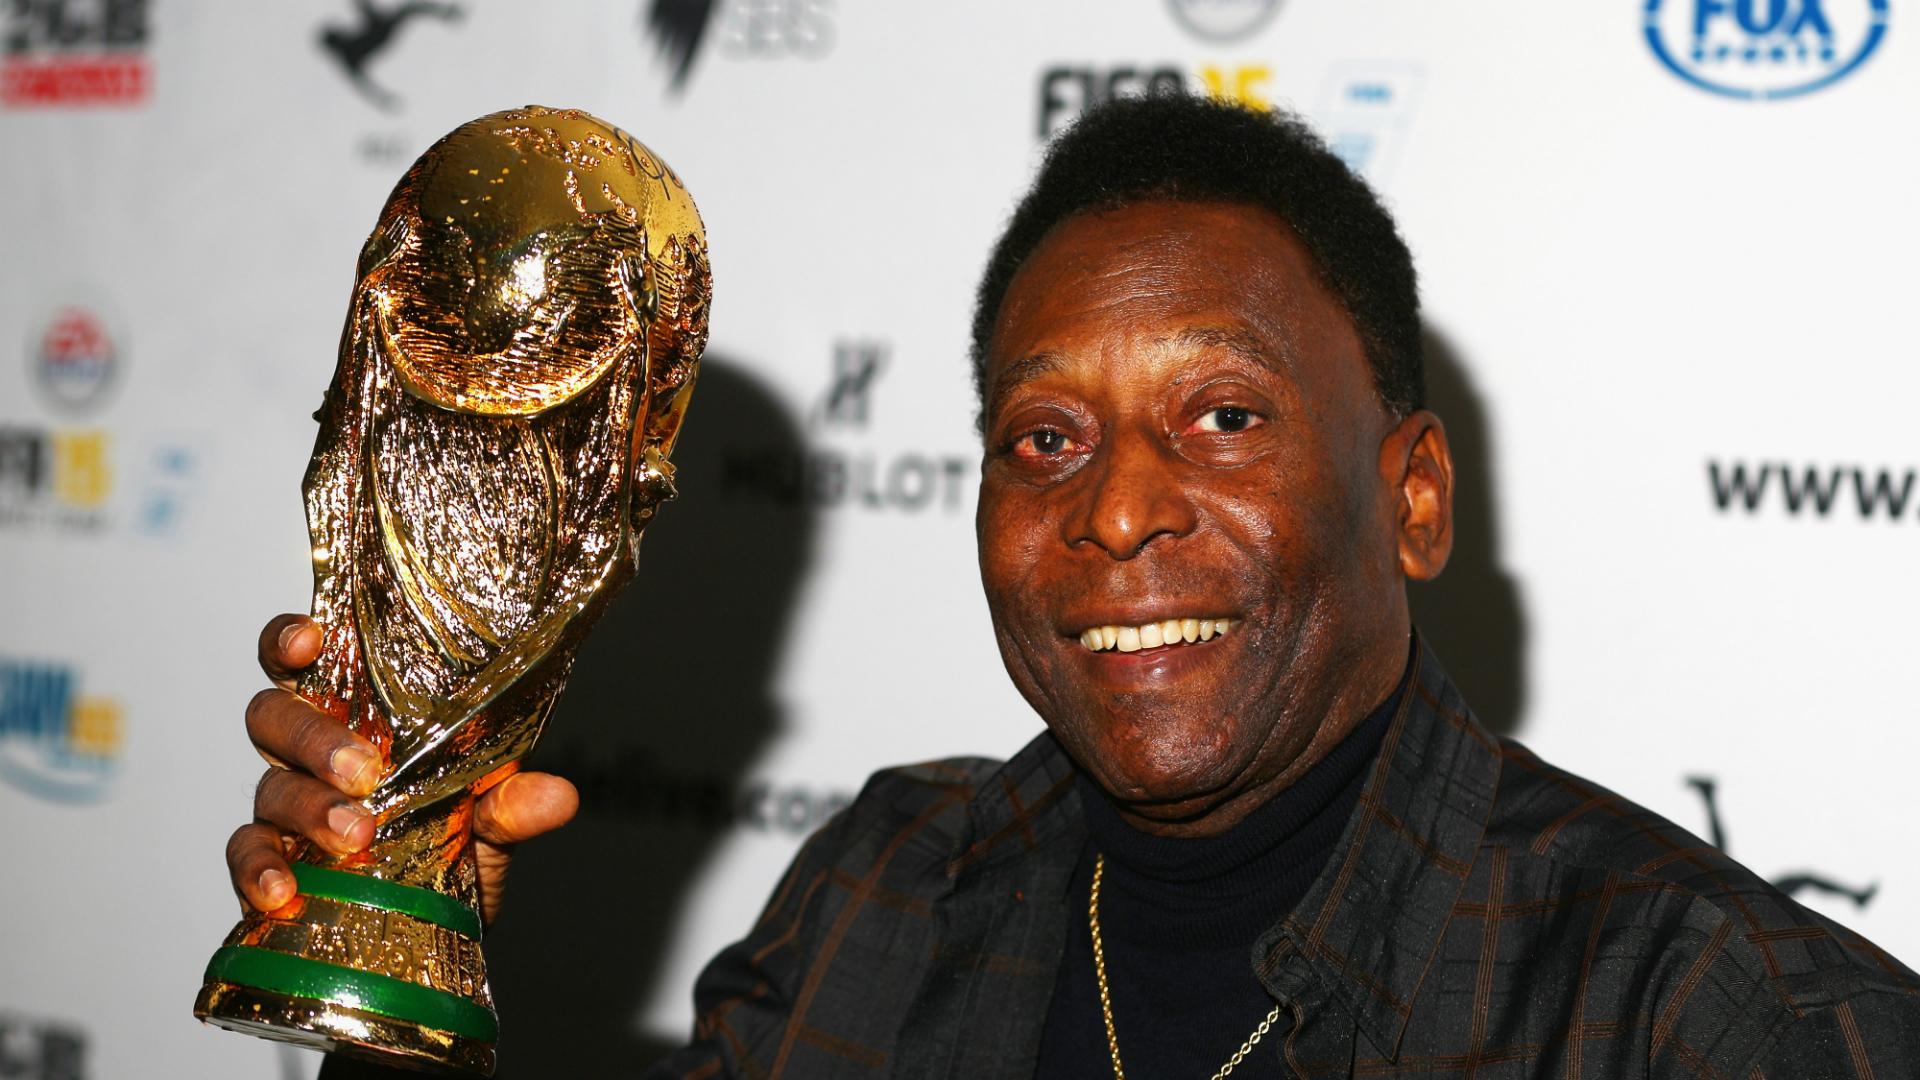 Pele back in Brazil after hospital stay